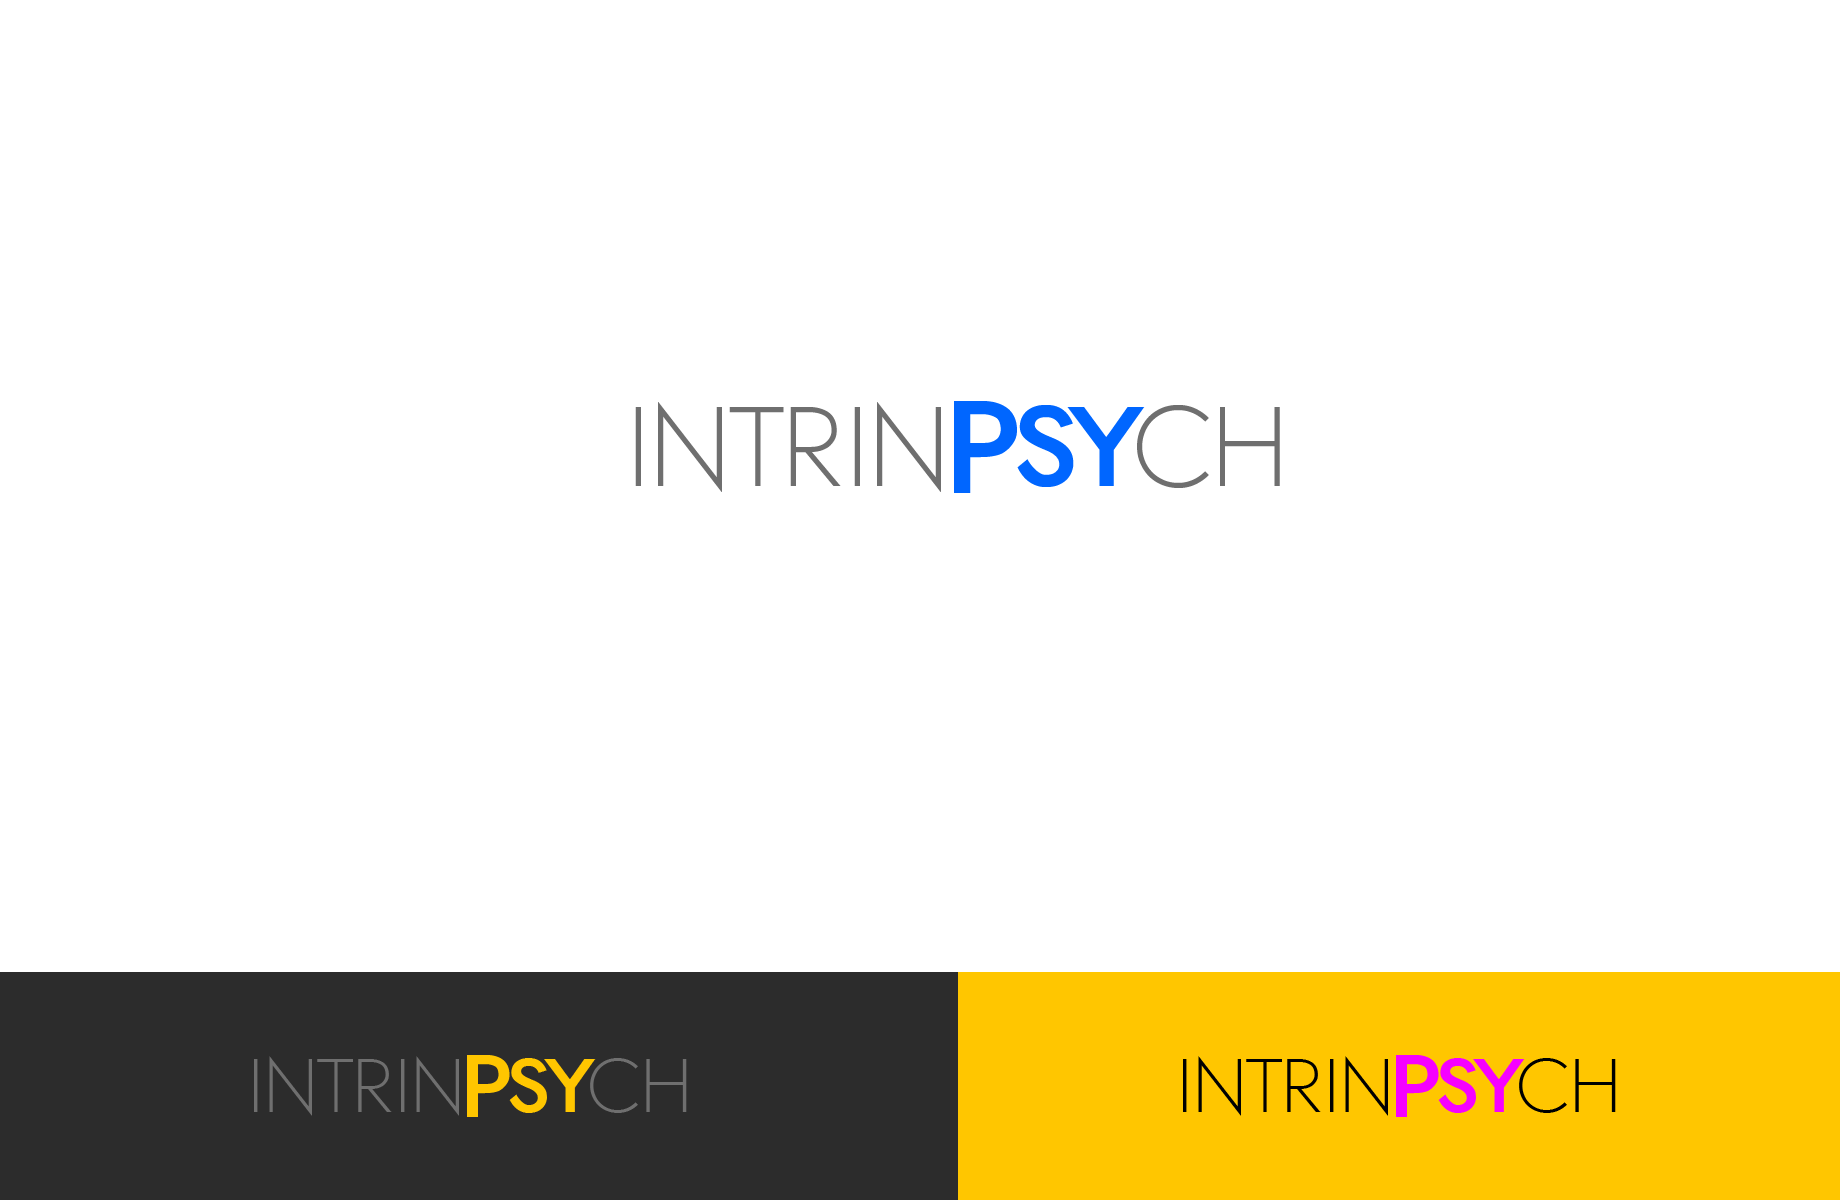 Logo Design by Jan Chua - Entry No. 94 in the Logo Design Contest New Logo Design for IntrinPsych.